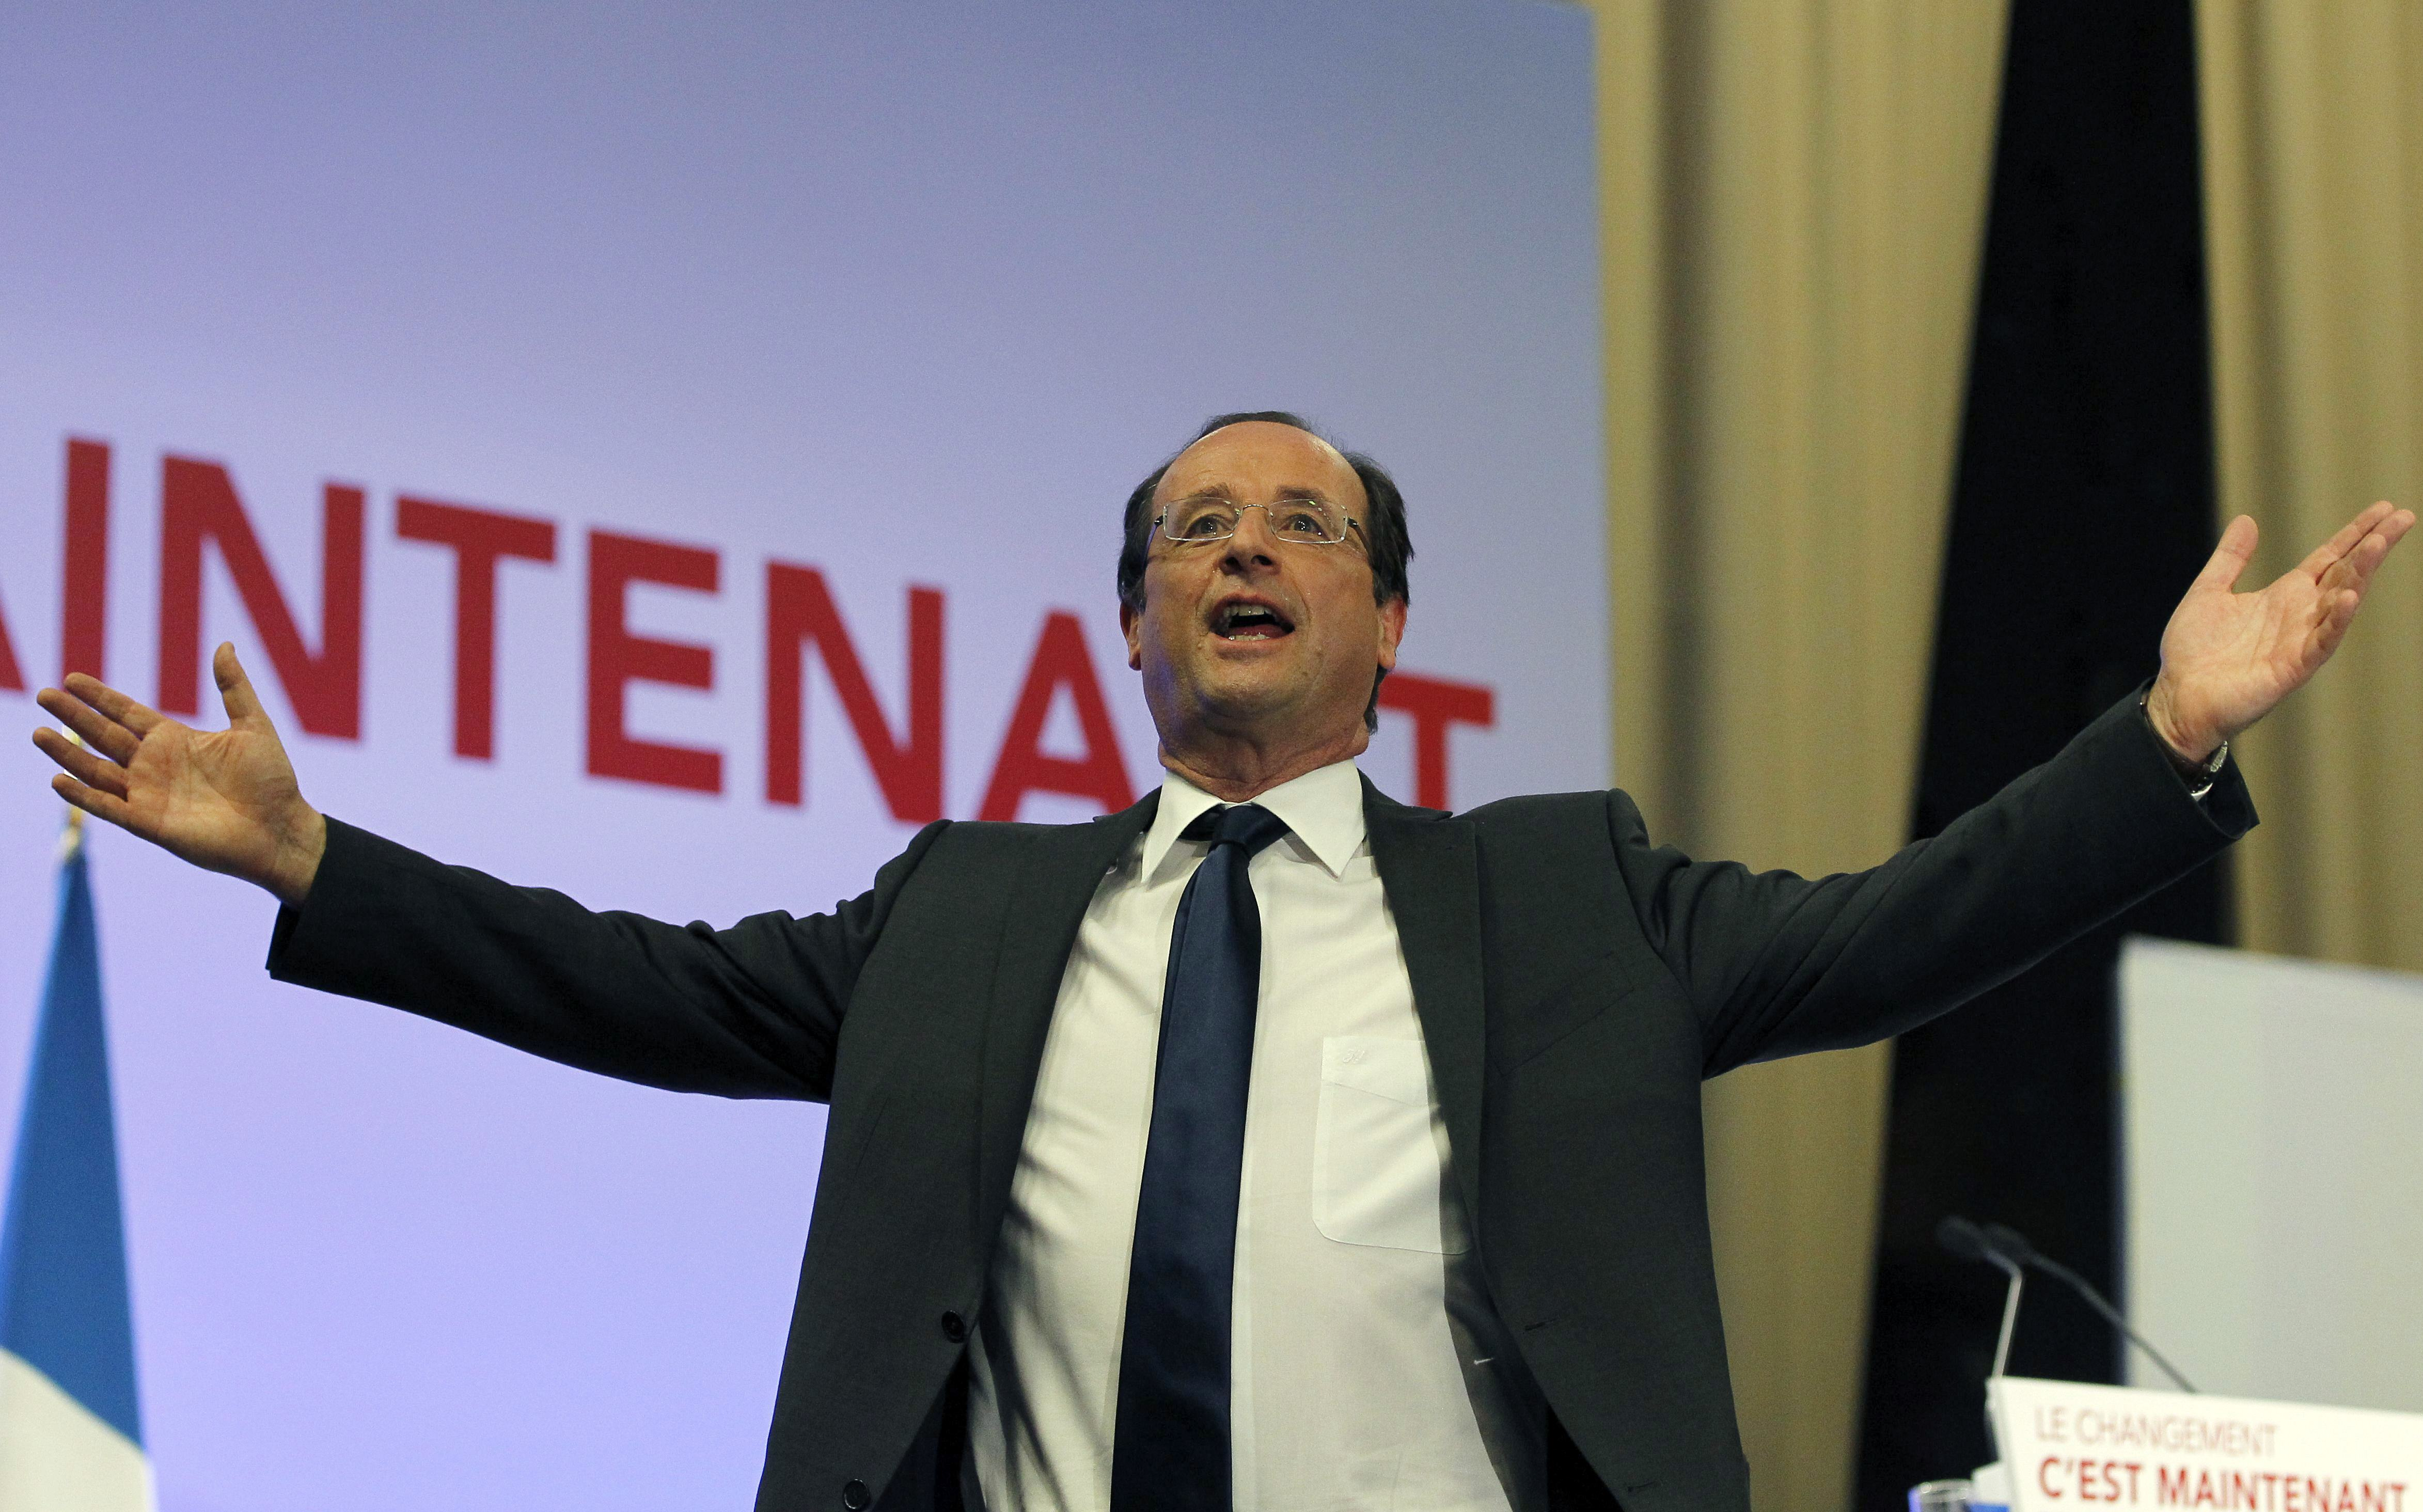 France : Pourquoi Hollande sera élu Président le 6 mai 2012